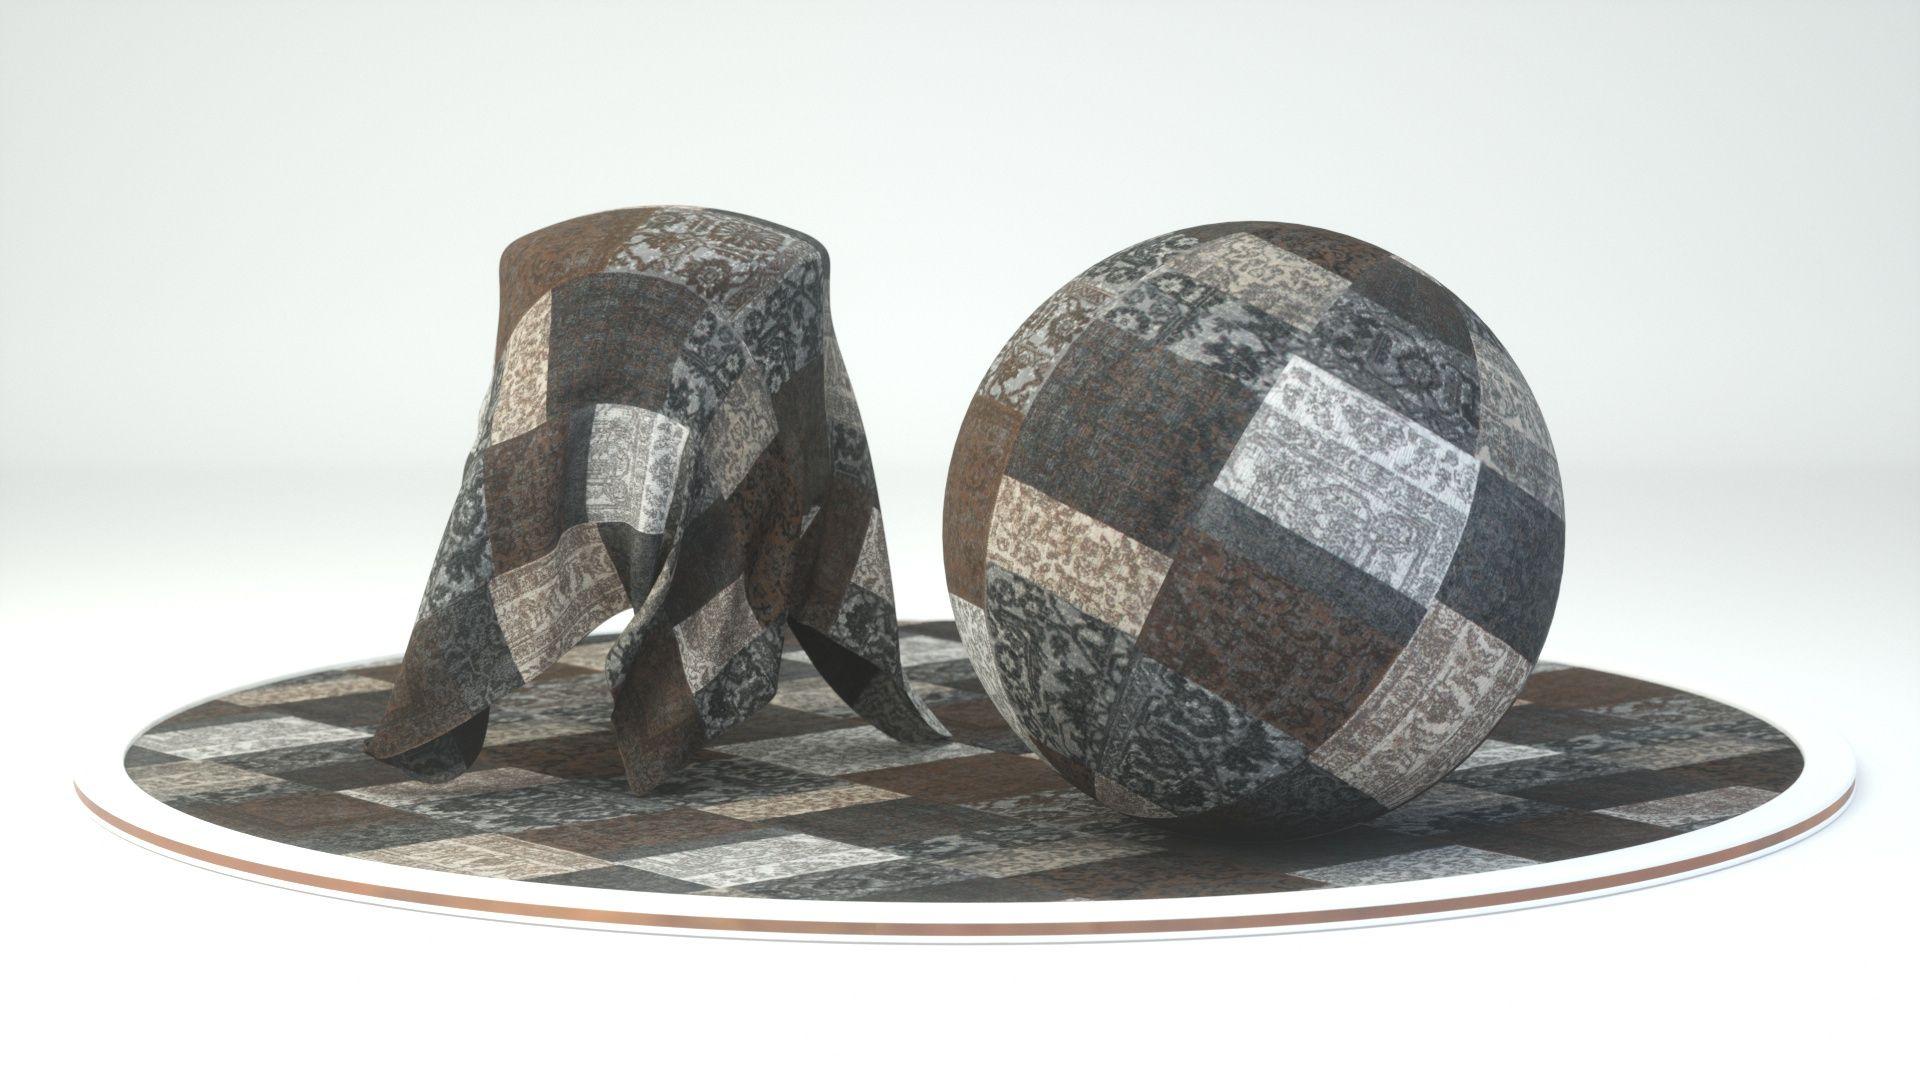 42 Fabric Materials for C4D Octane Render #Materials